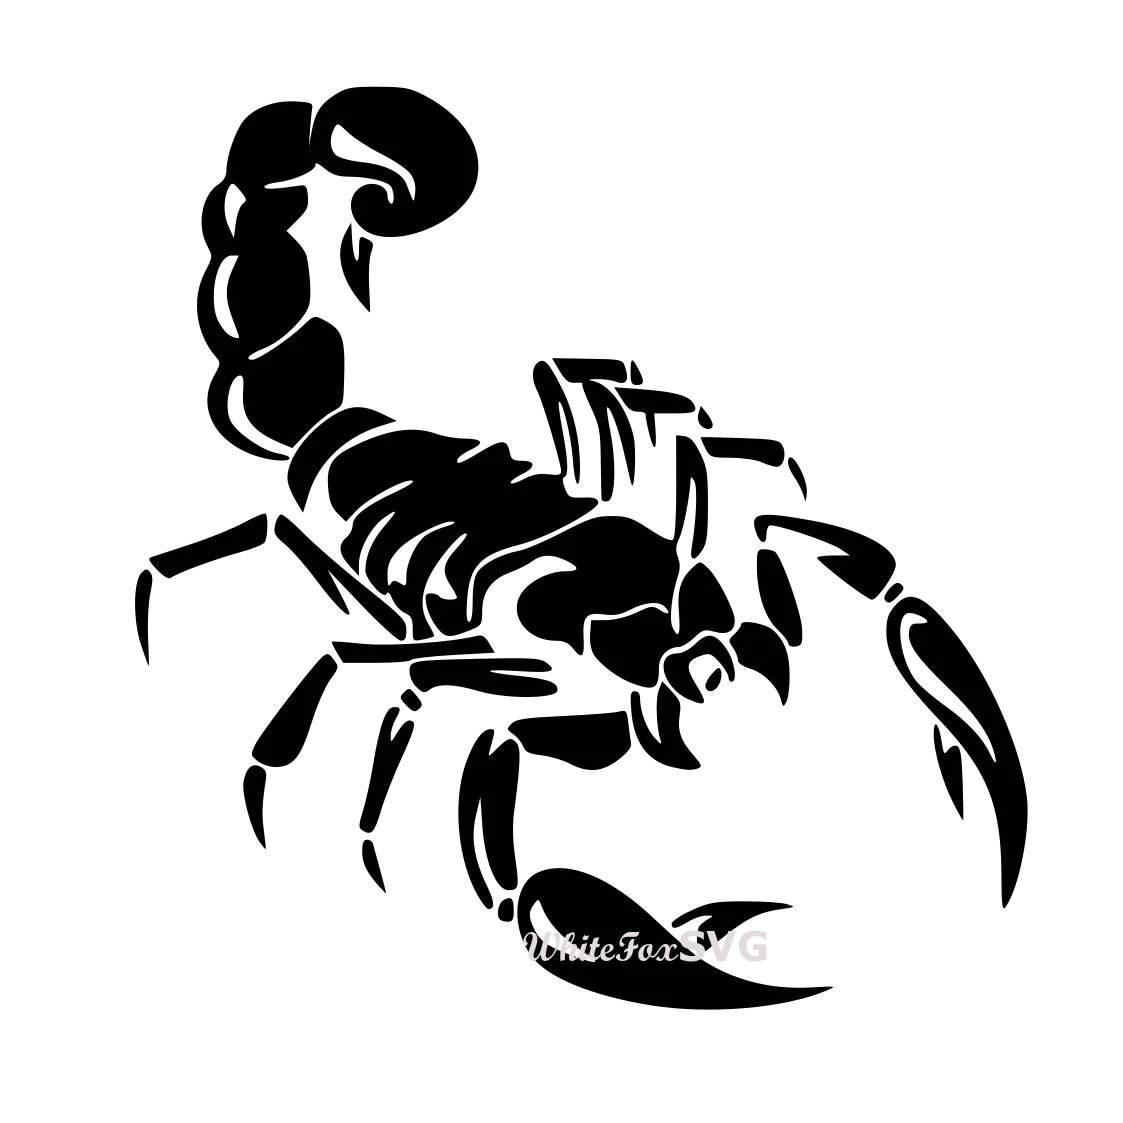 Scorpion Clipart Stencil Decal Sticker Template Transfer